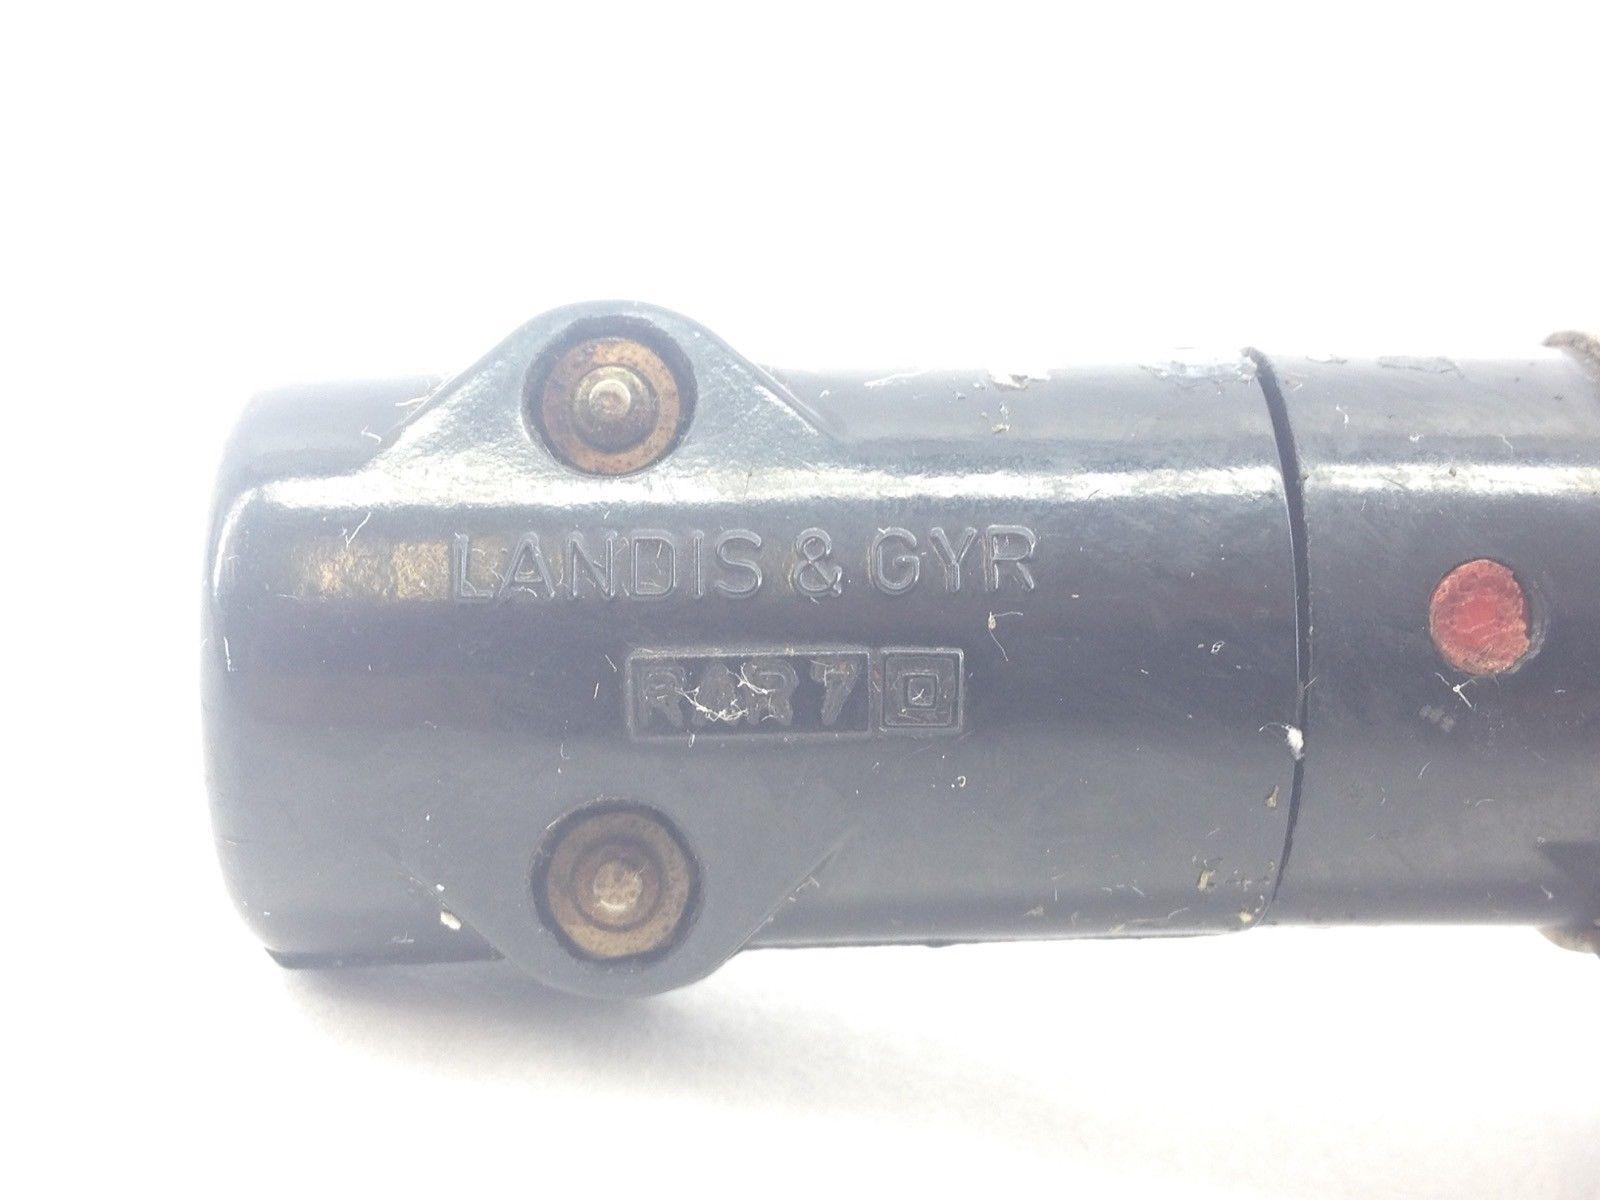 LANDIS & GYR RAR7 FLAME DETECTOR PHOTOCELL (A823) 3